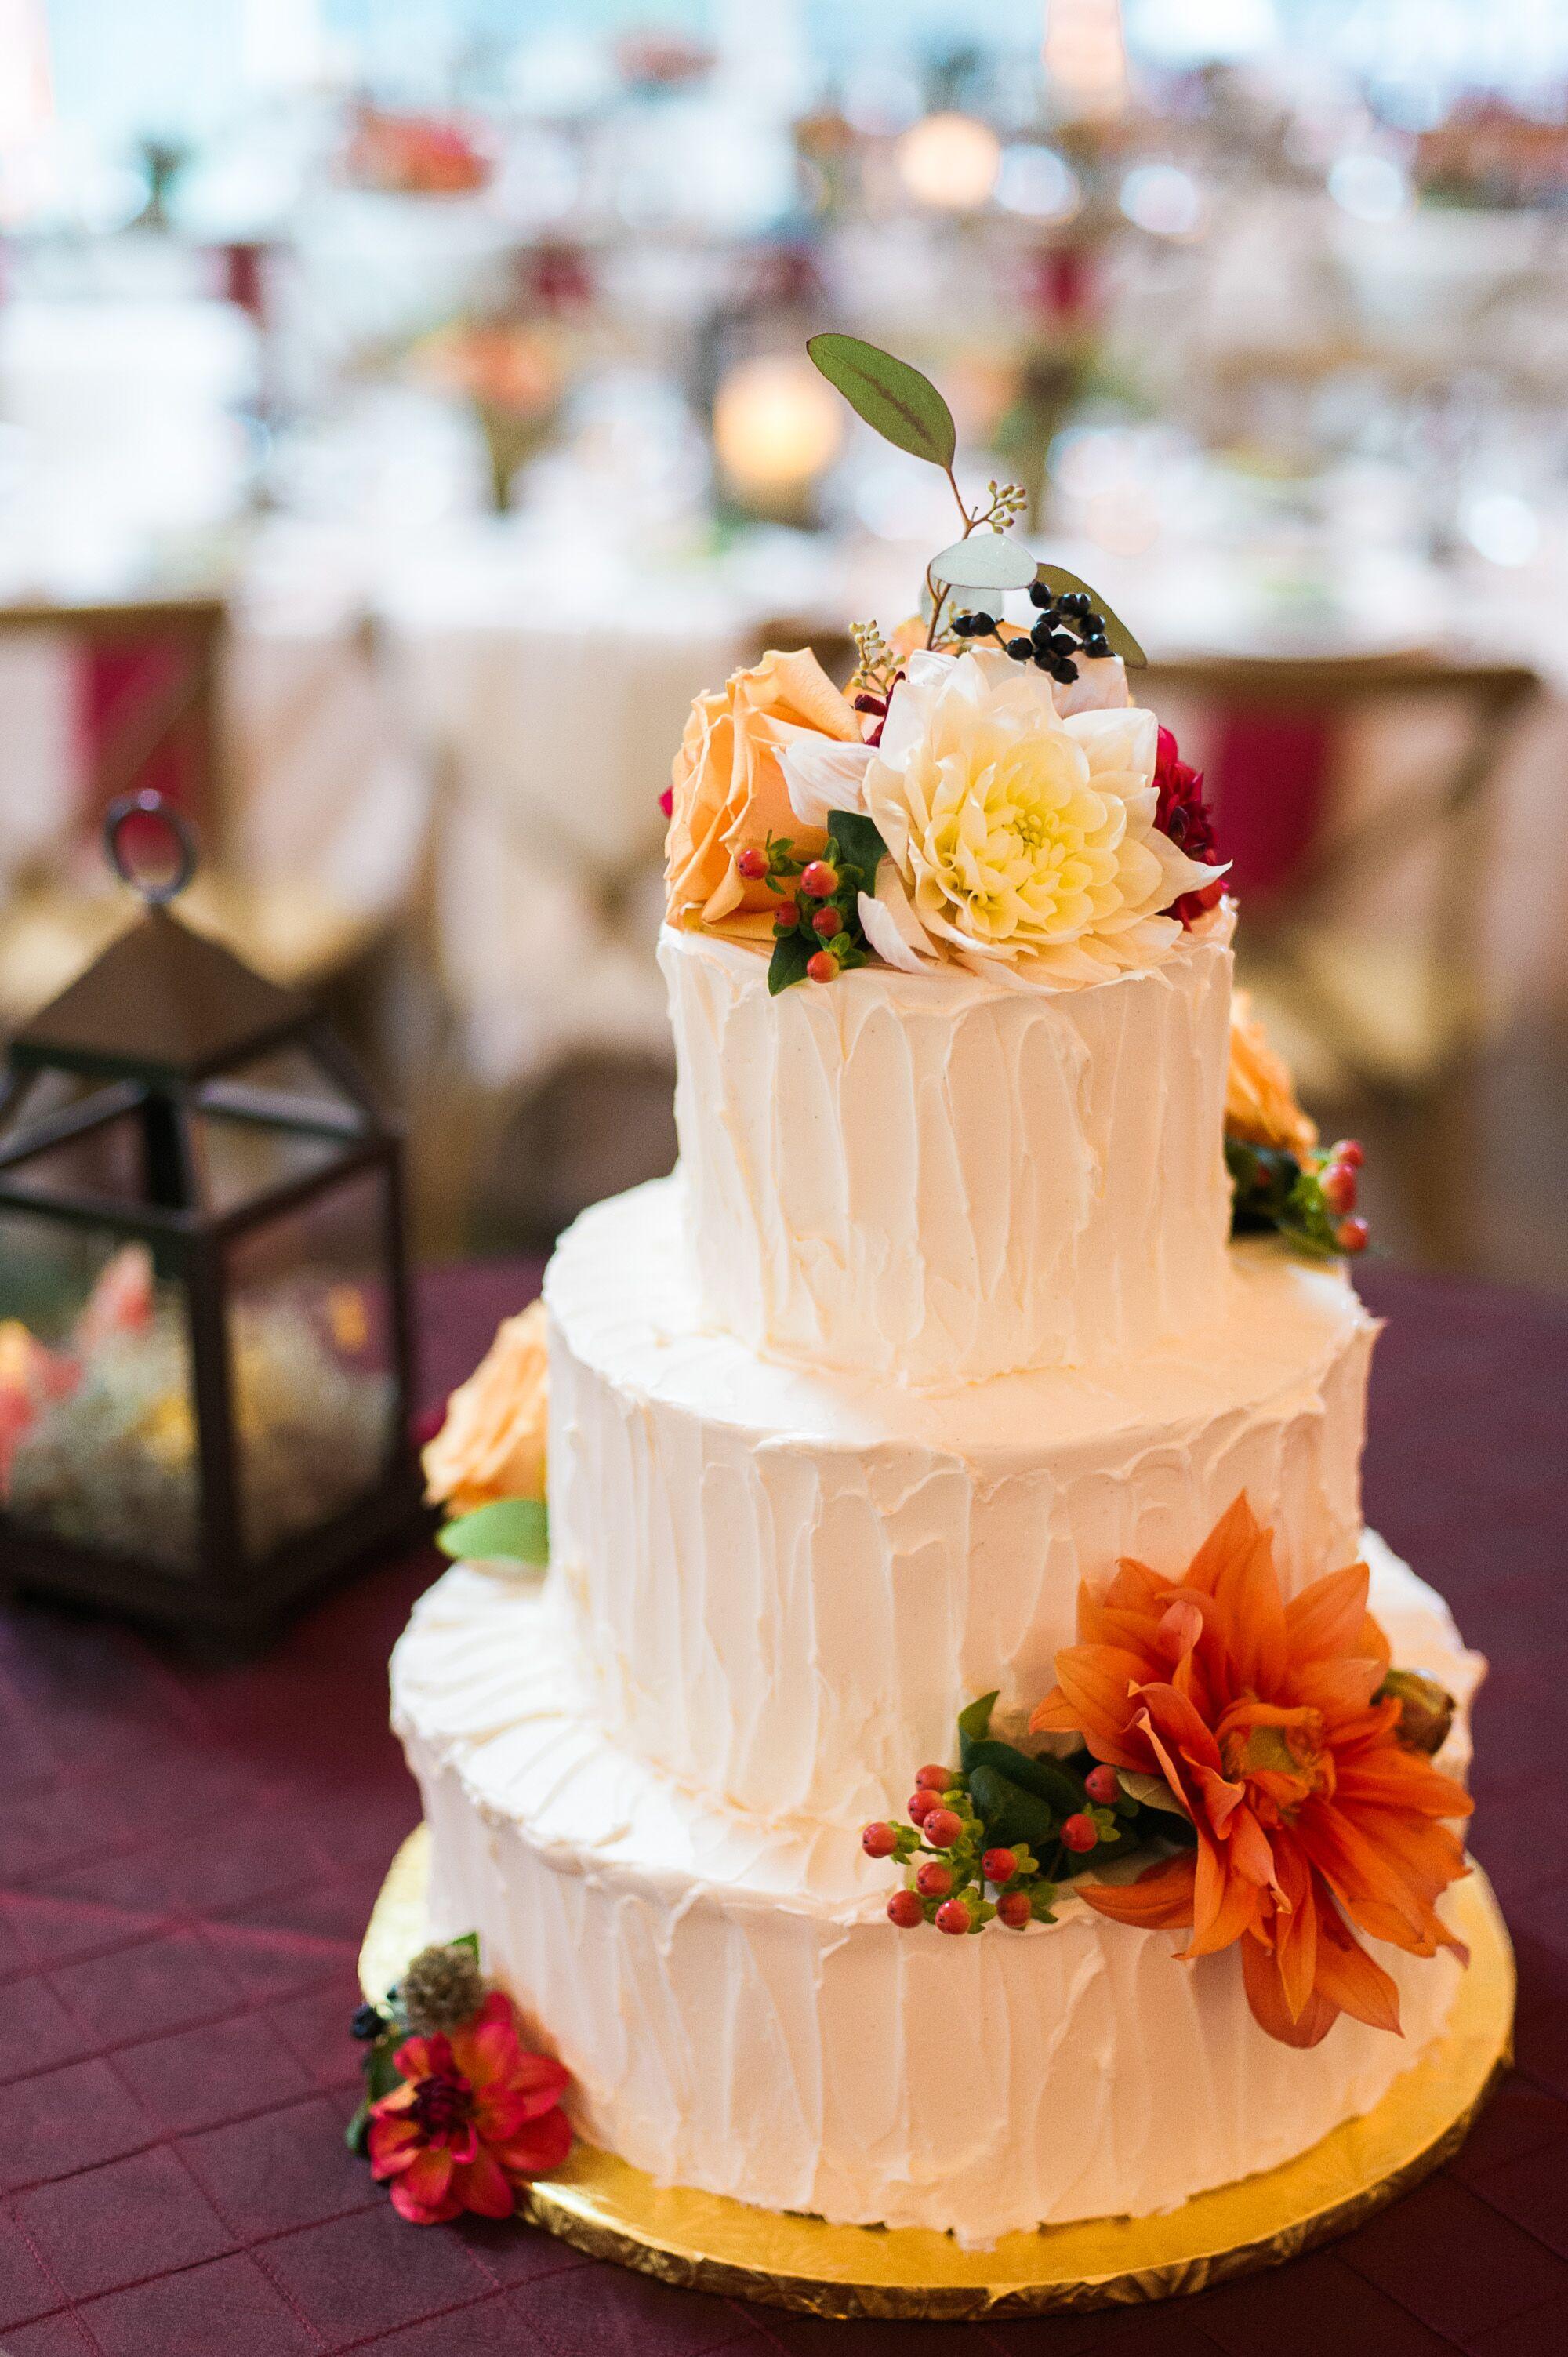 Semi-Naked Cake with Succulents | Wedding cakes